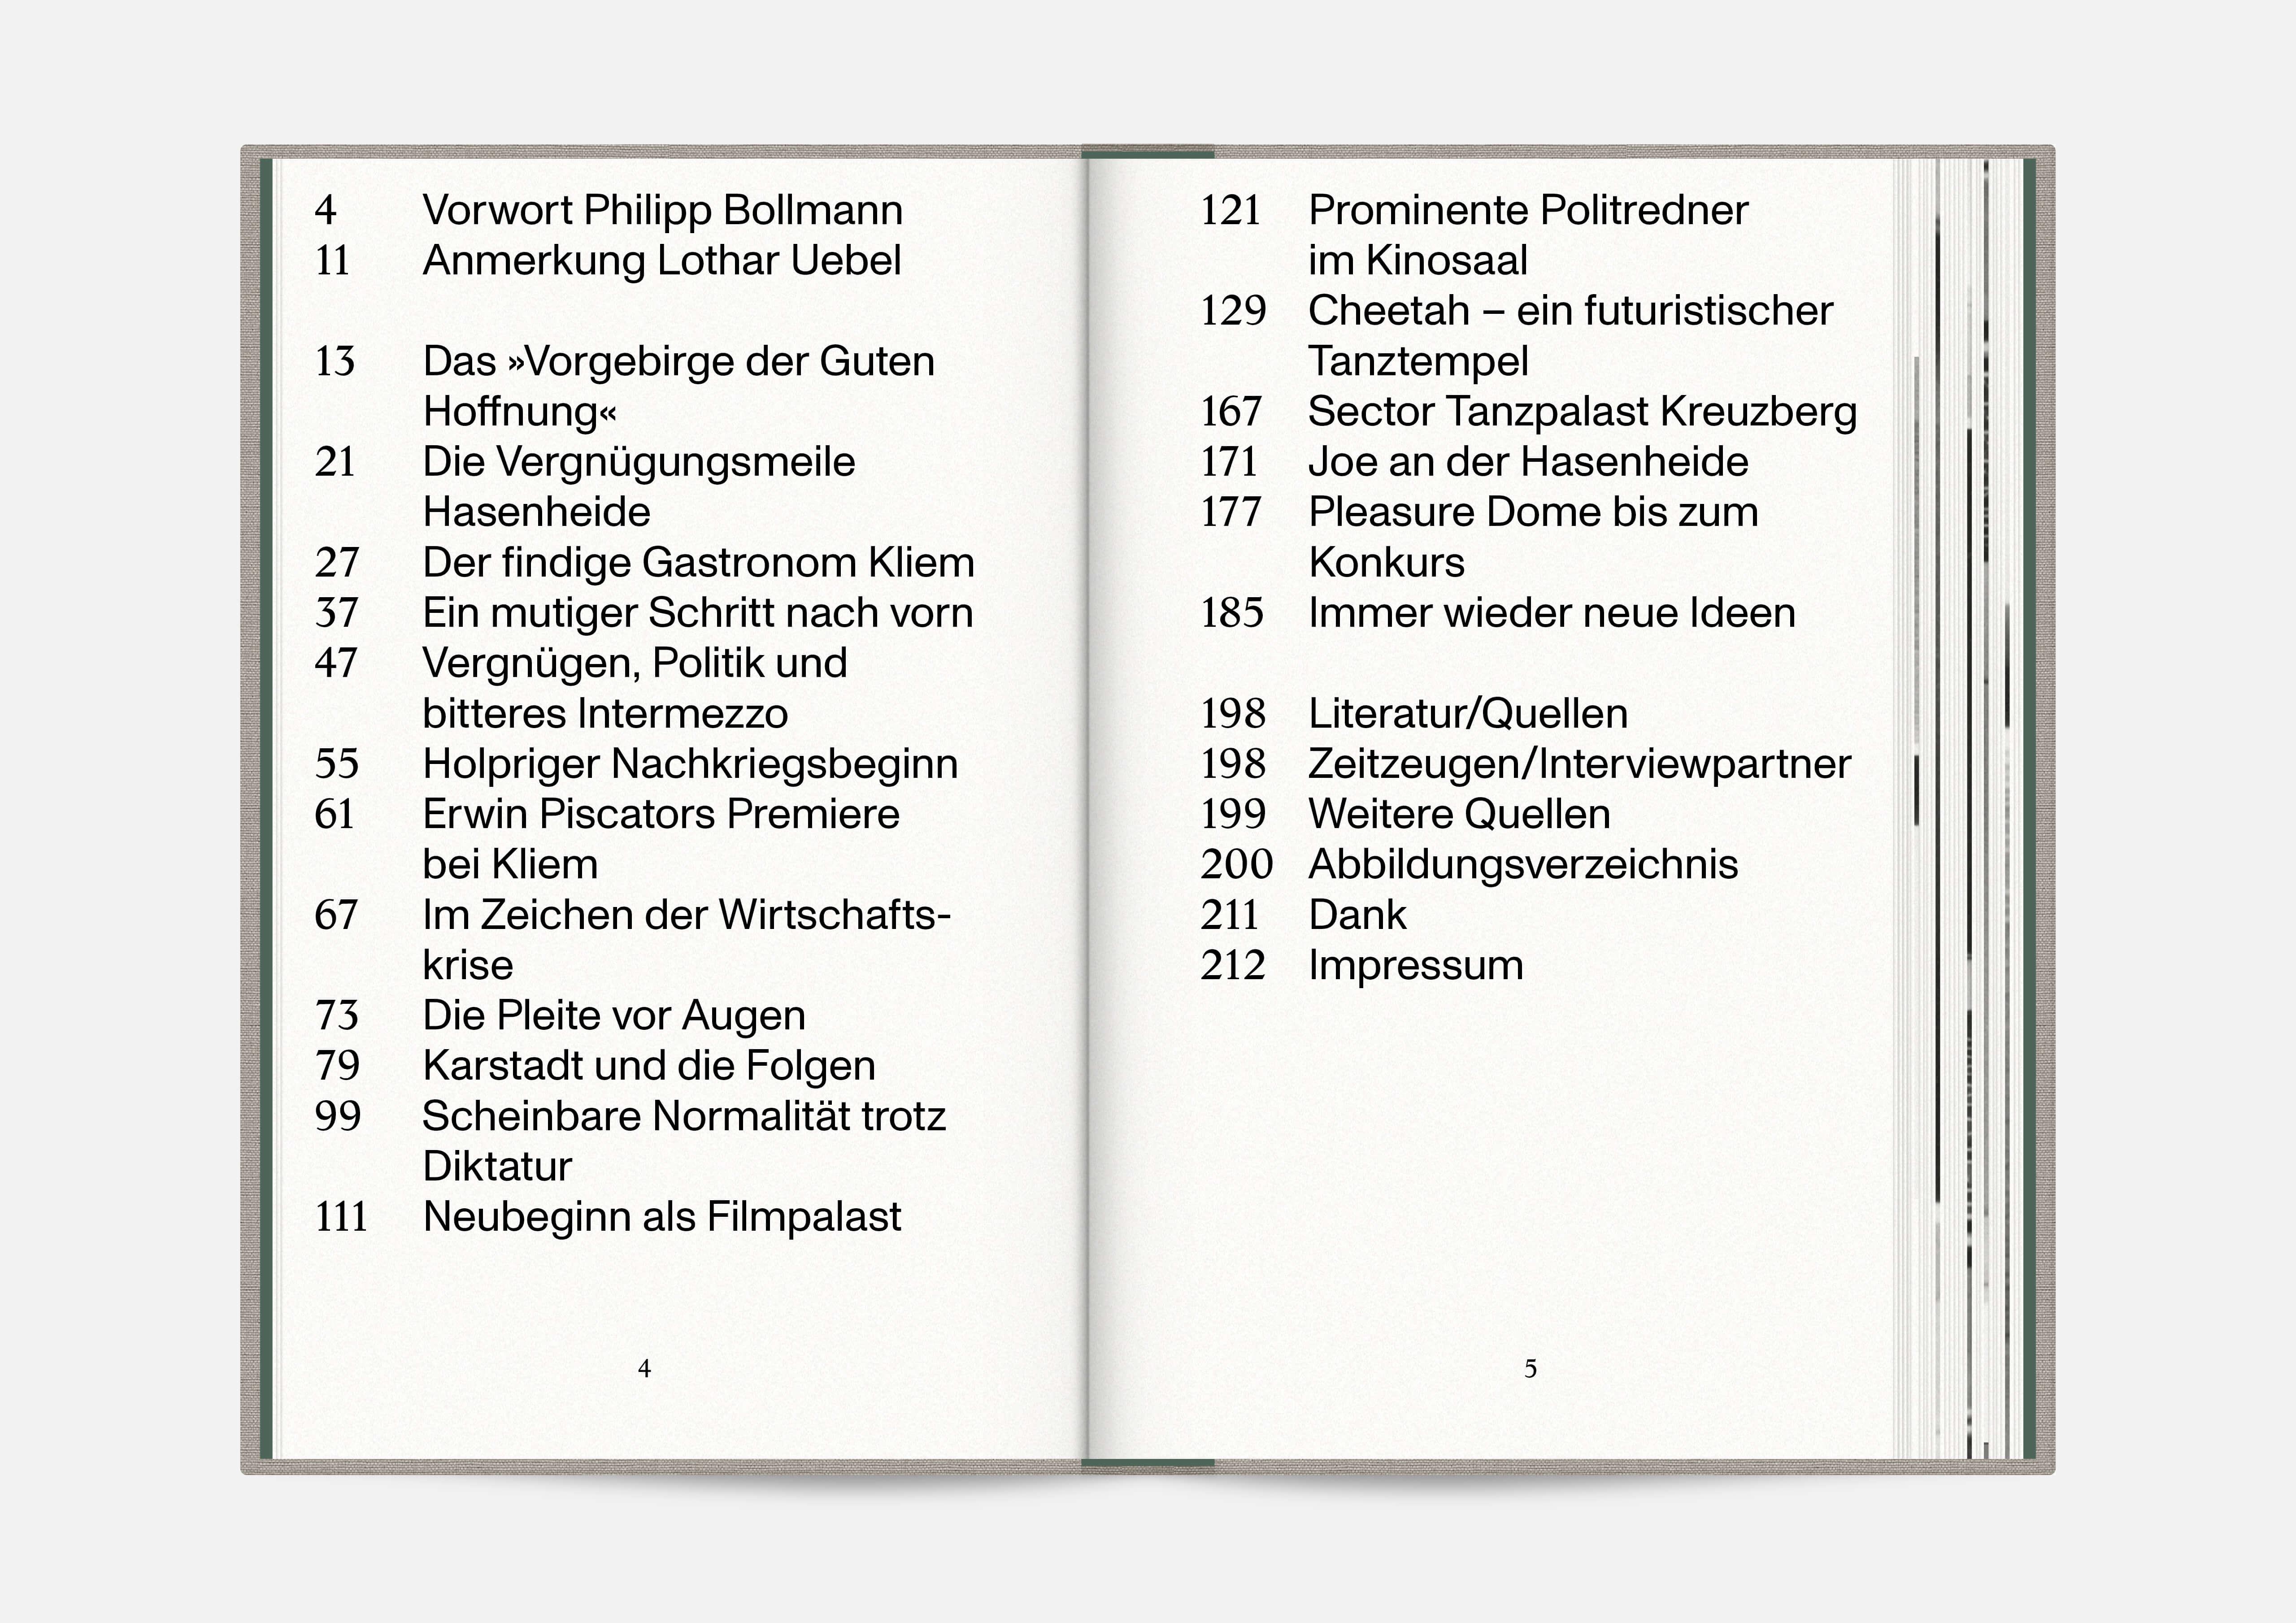 https://neuegestaltung.de/media/pages/clients/sammlung-wemhoner-hasenheide-13/6790e83ffe-1628761379/sw-hasenheide_2.jpg